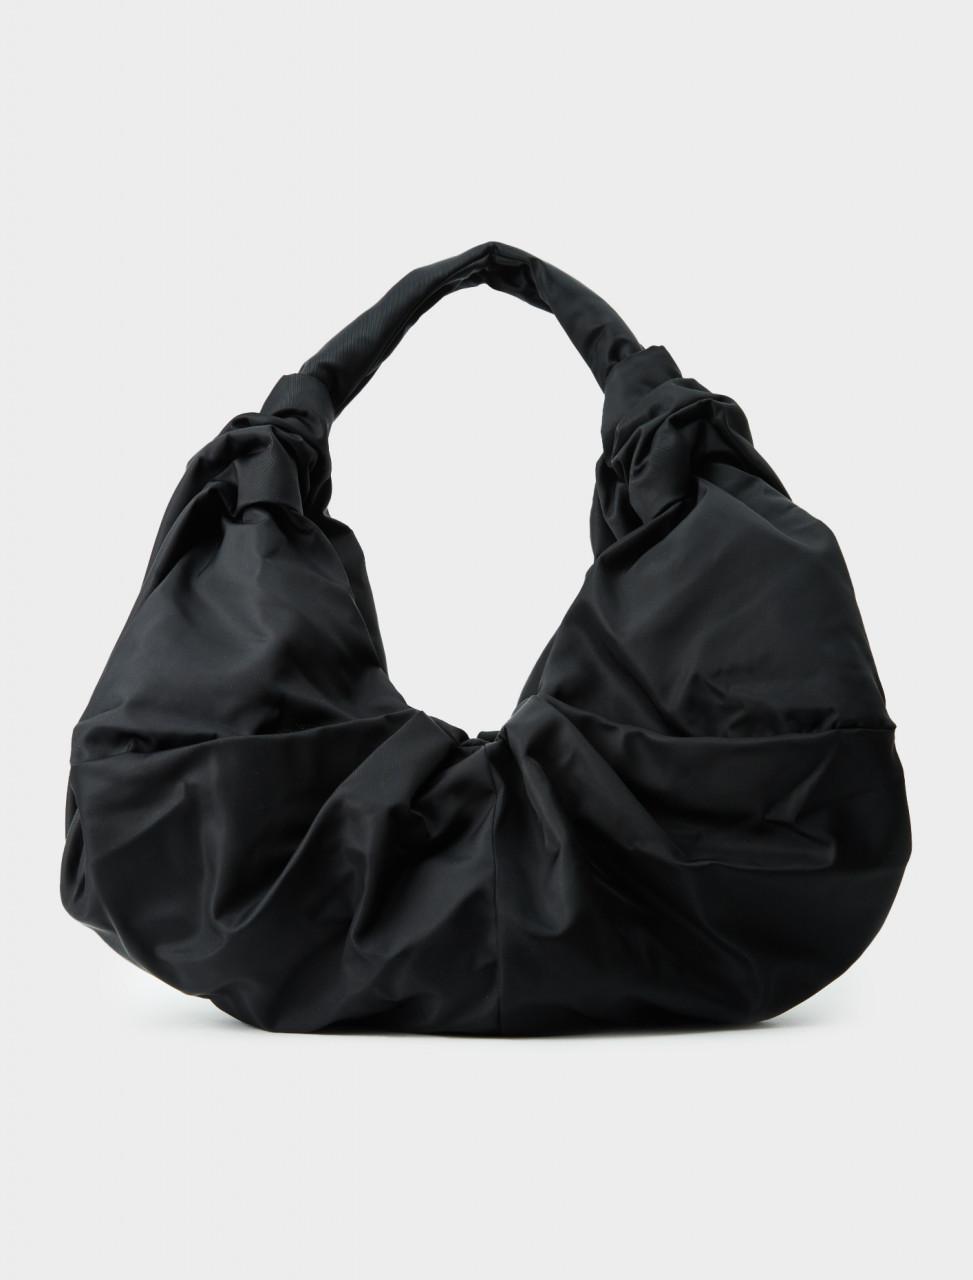 Simone Rocha Taffeta Large Pleated Shoulder Bag with Zip in Black